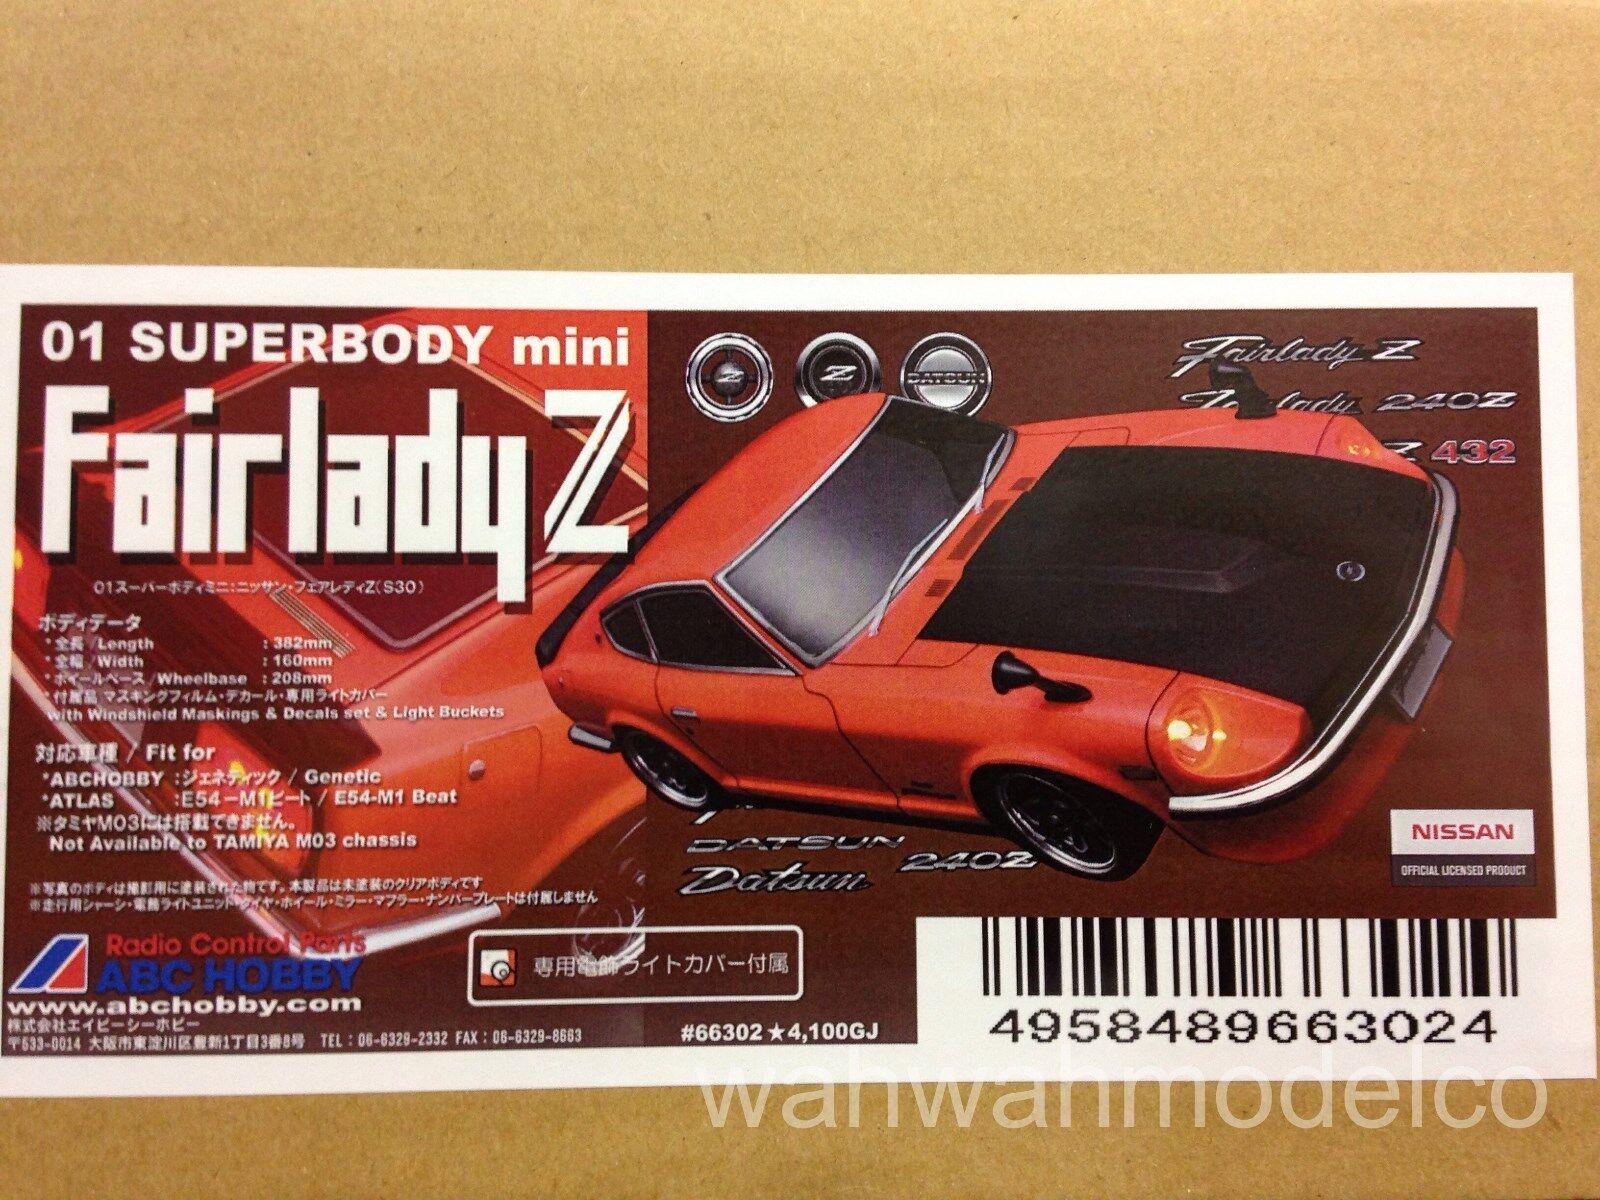 ABC Hobby 66302 1  10 Super Body Mini Fairlady Z Clear Body Set